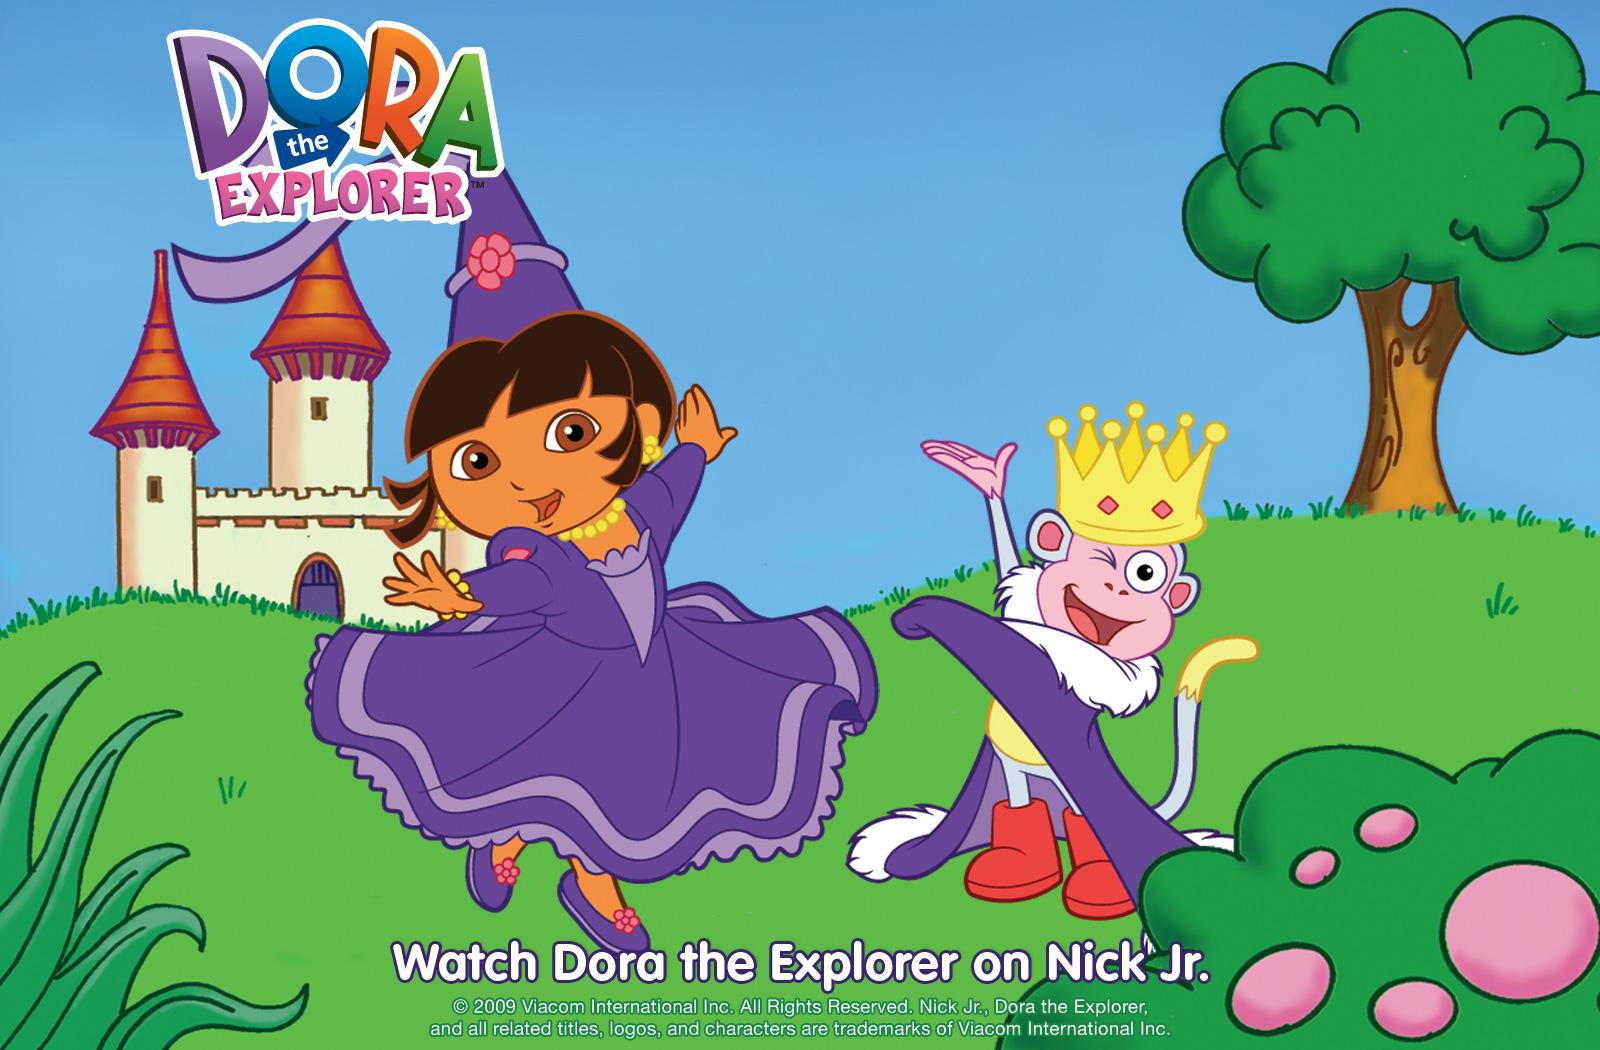 ... Entretenimiento Infantil: Fondos de pantalla Dora la Exploradora 02